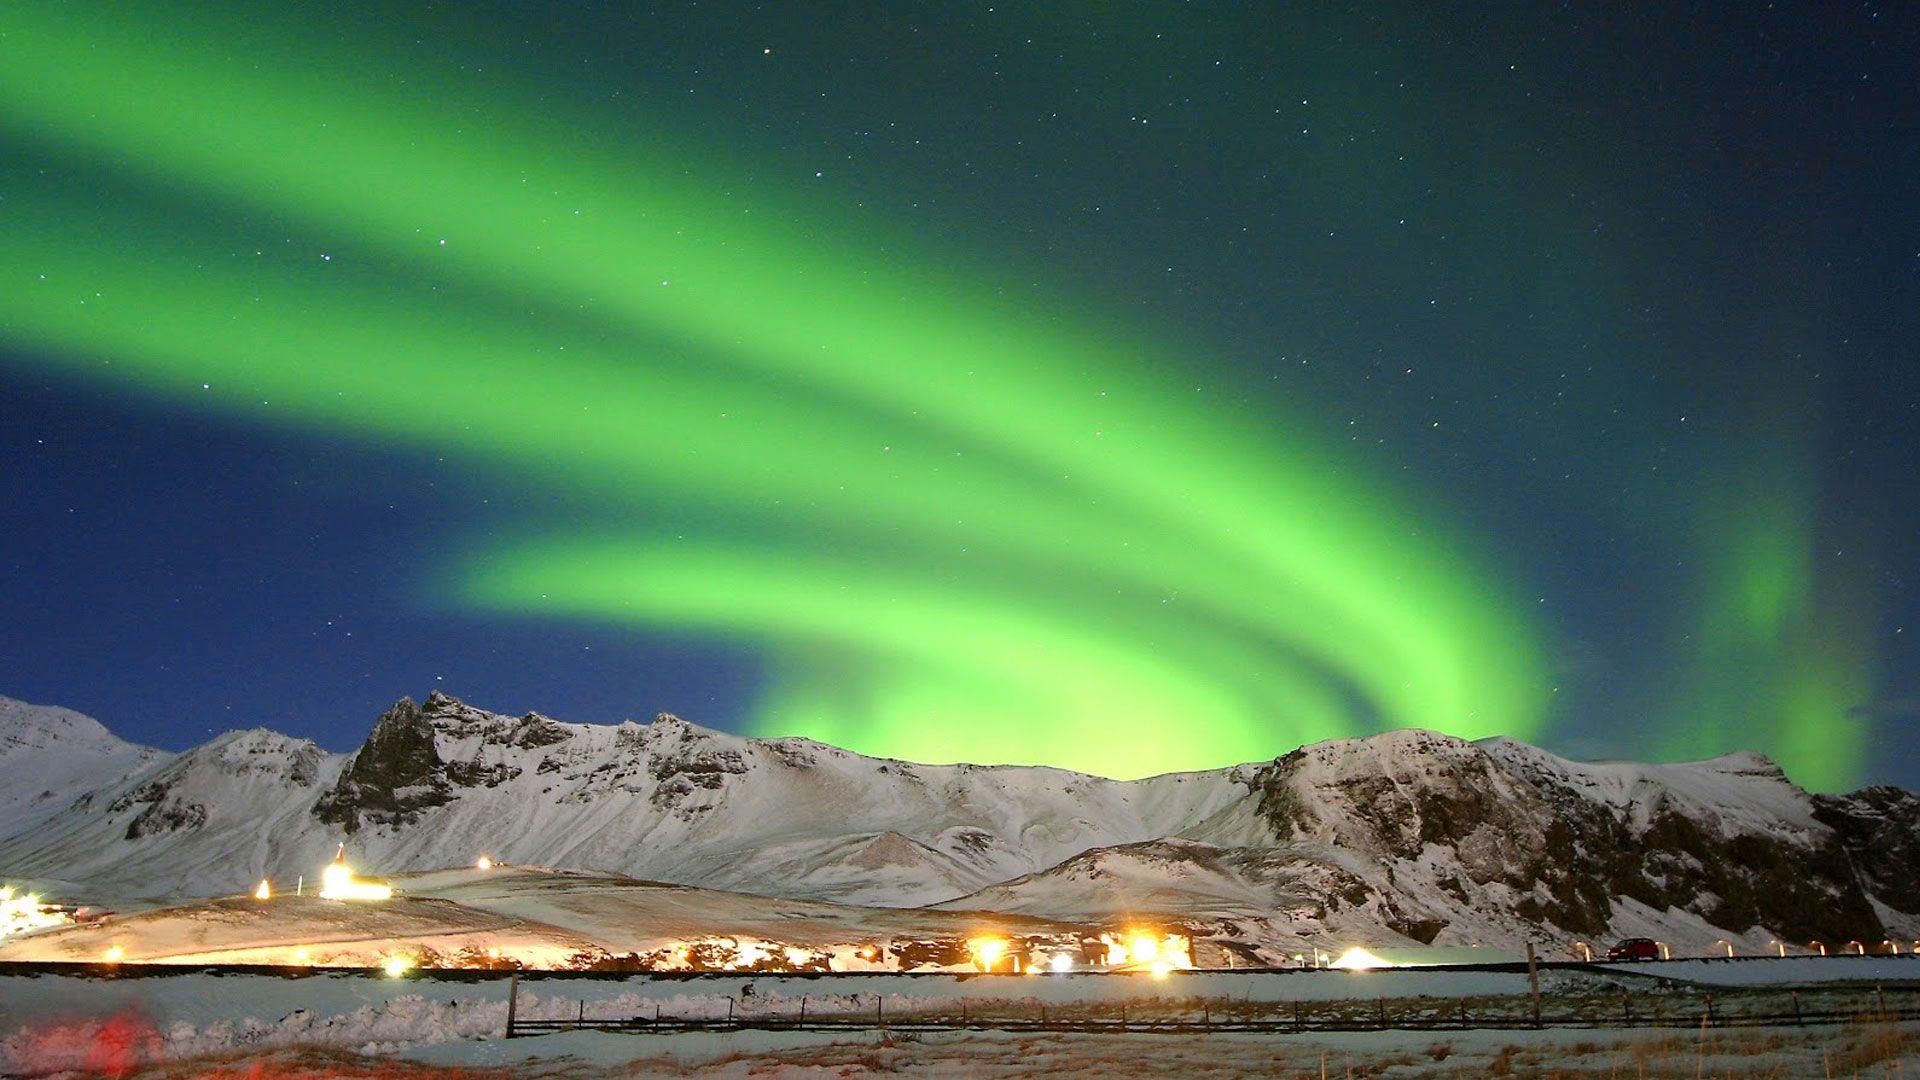 Iceland Northern Lights Wallpaper Hd